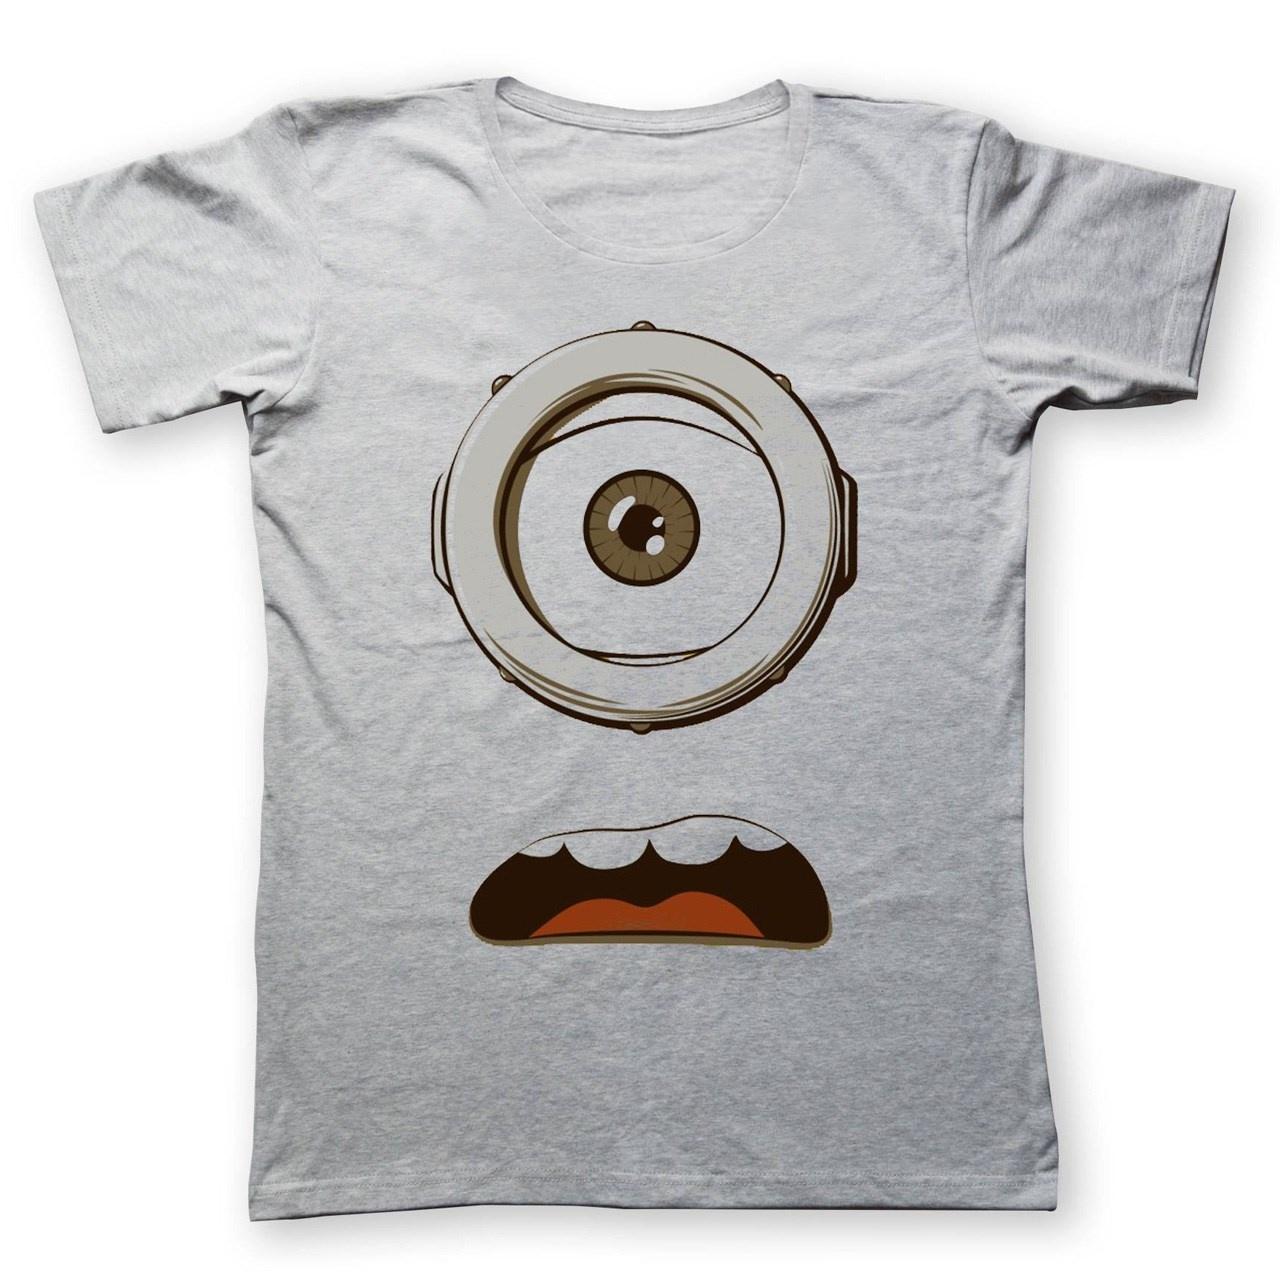 تی شرت به رسم طرح چشم مینیون کد 251